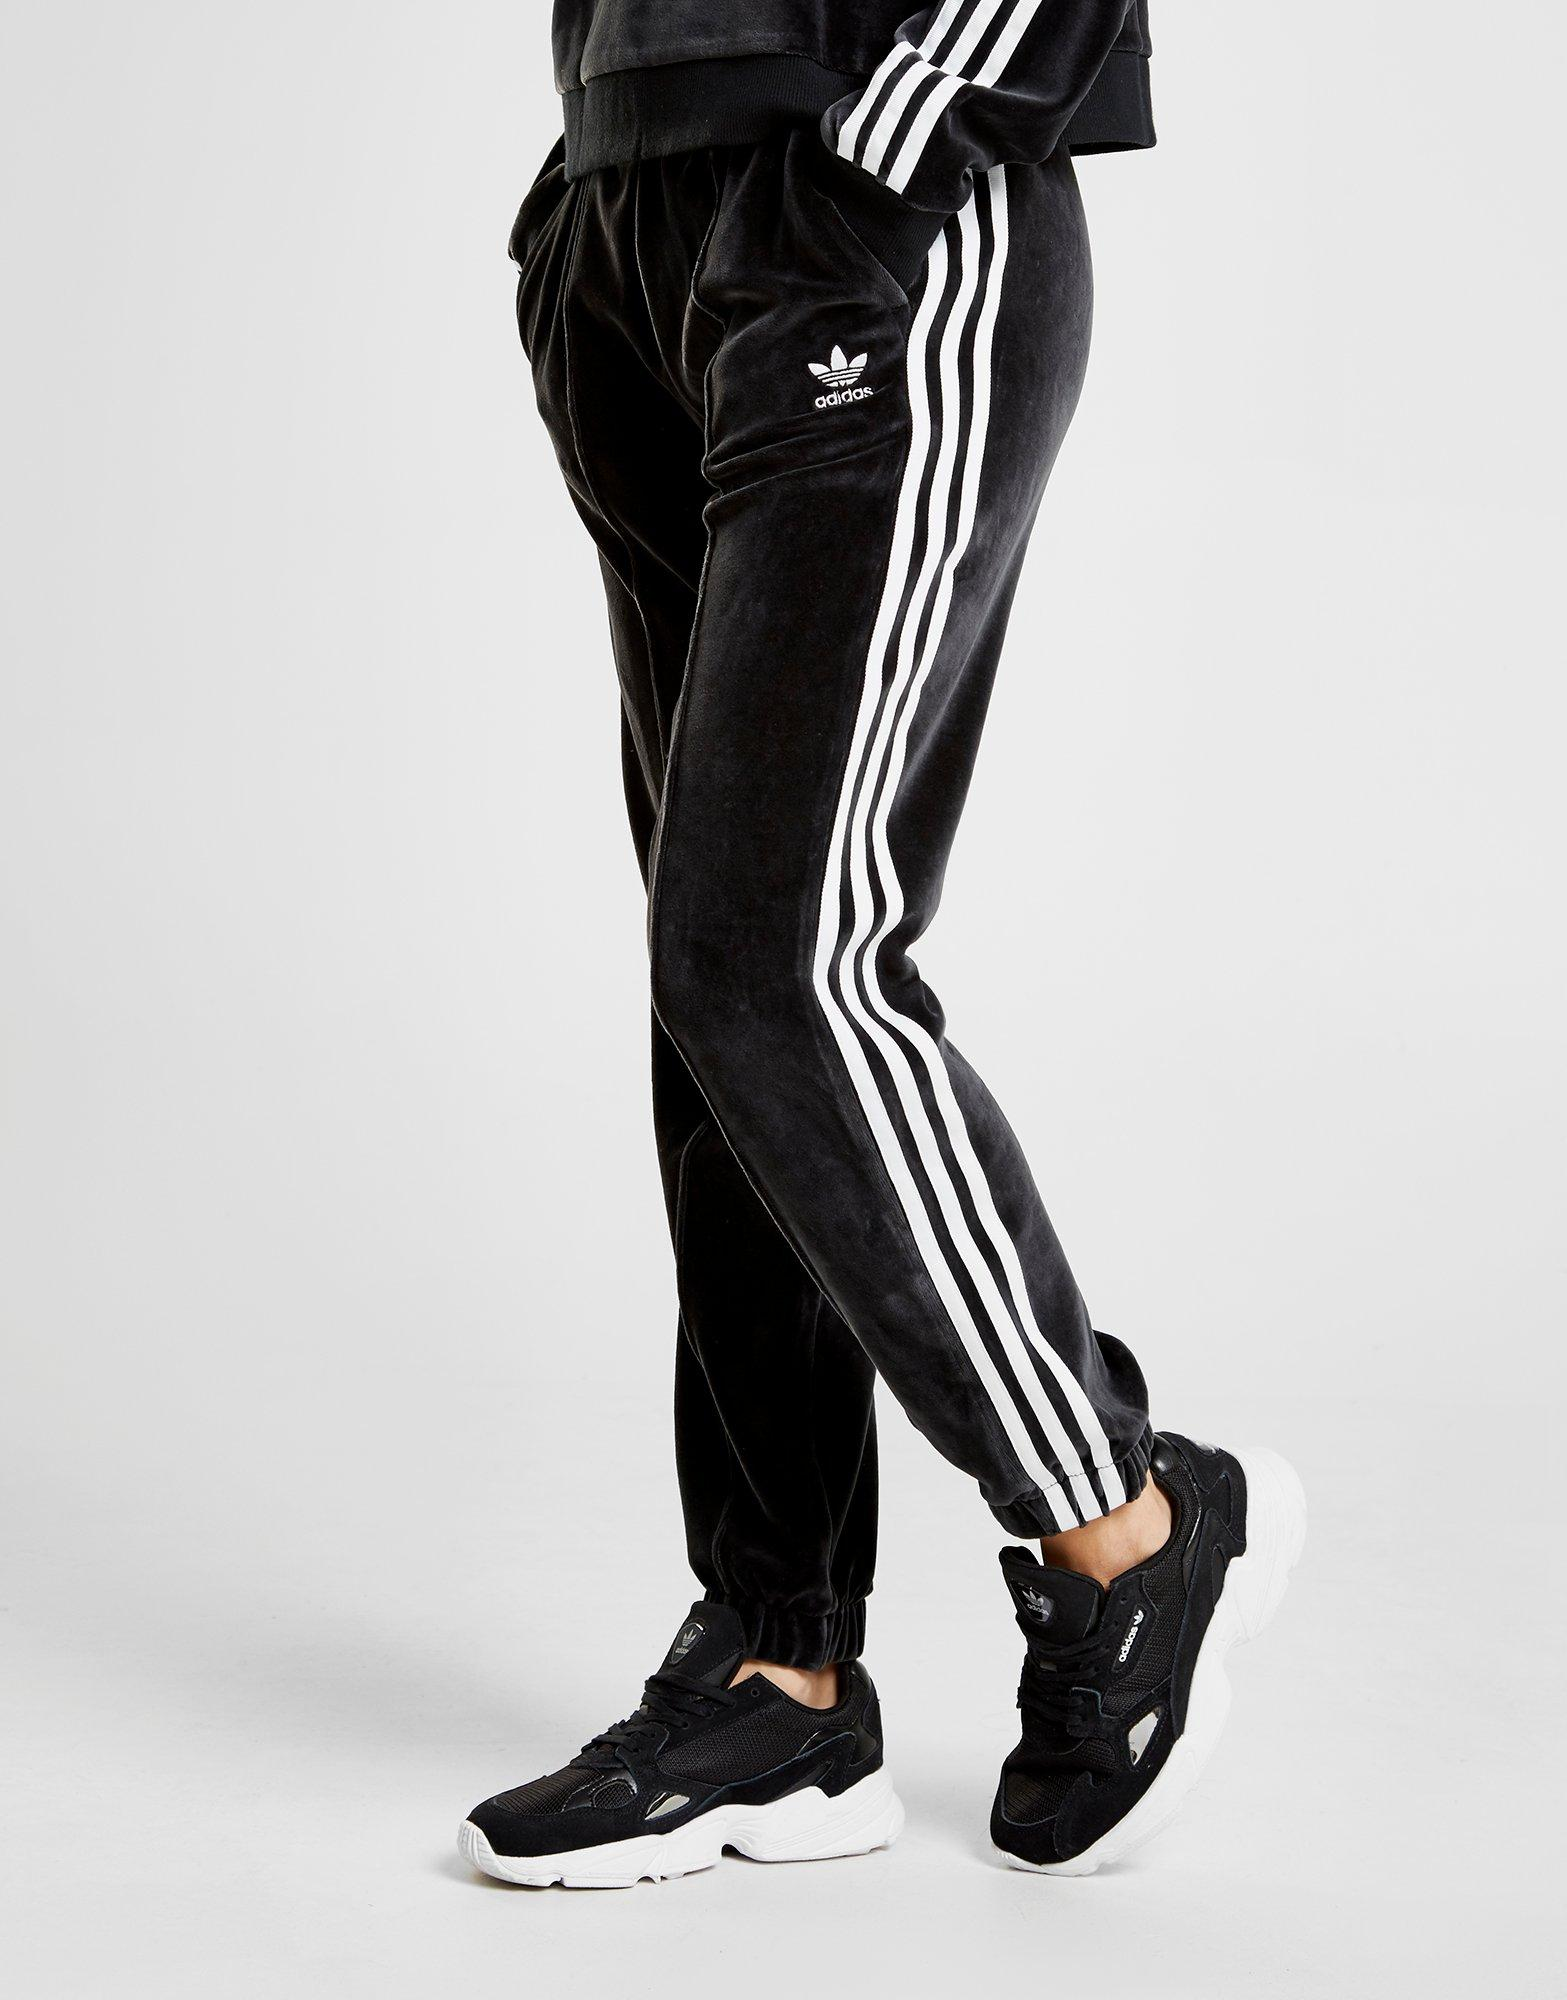 adidas bukser kvinder